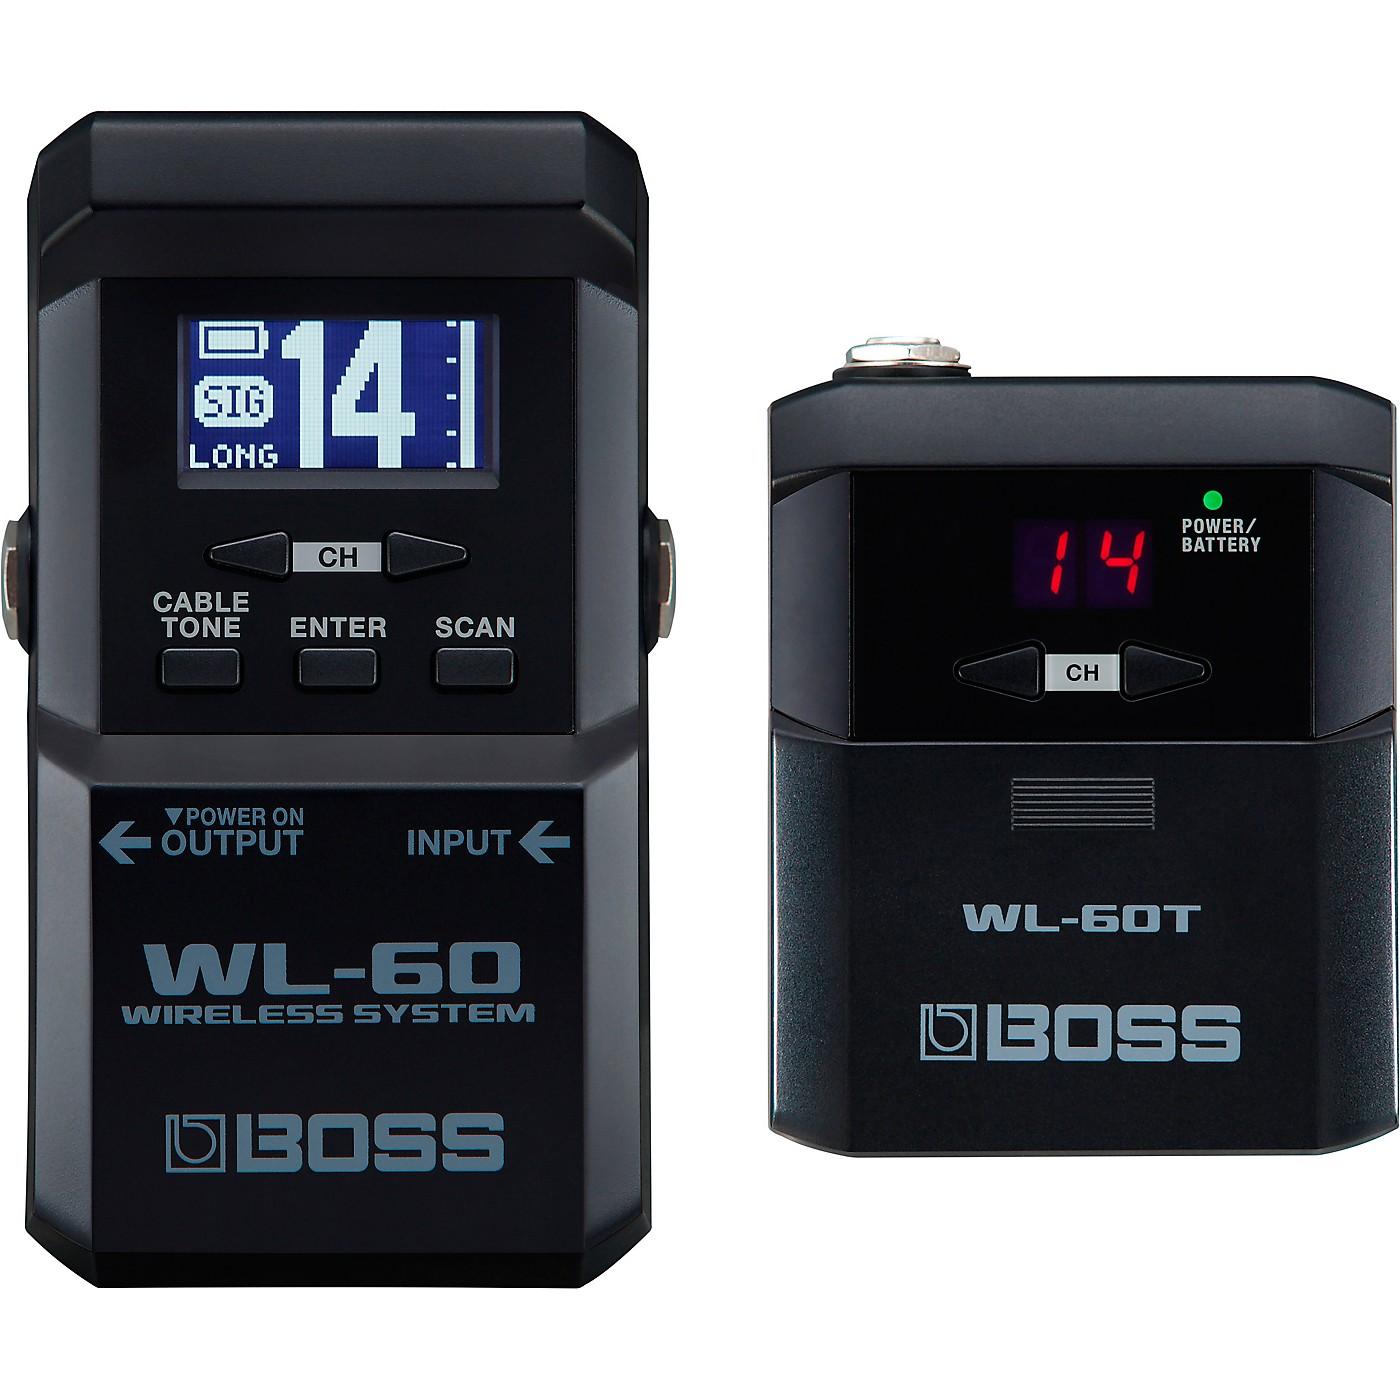 BOSS WL-60 Wireless System thumbnail